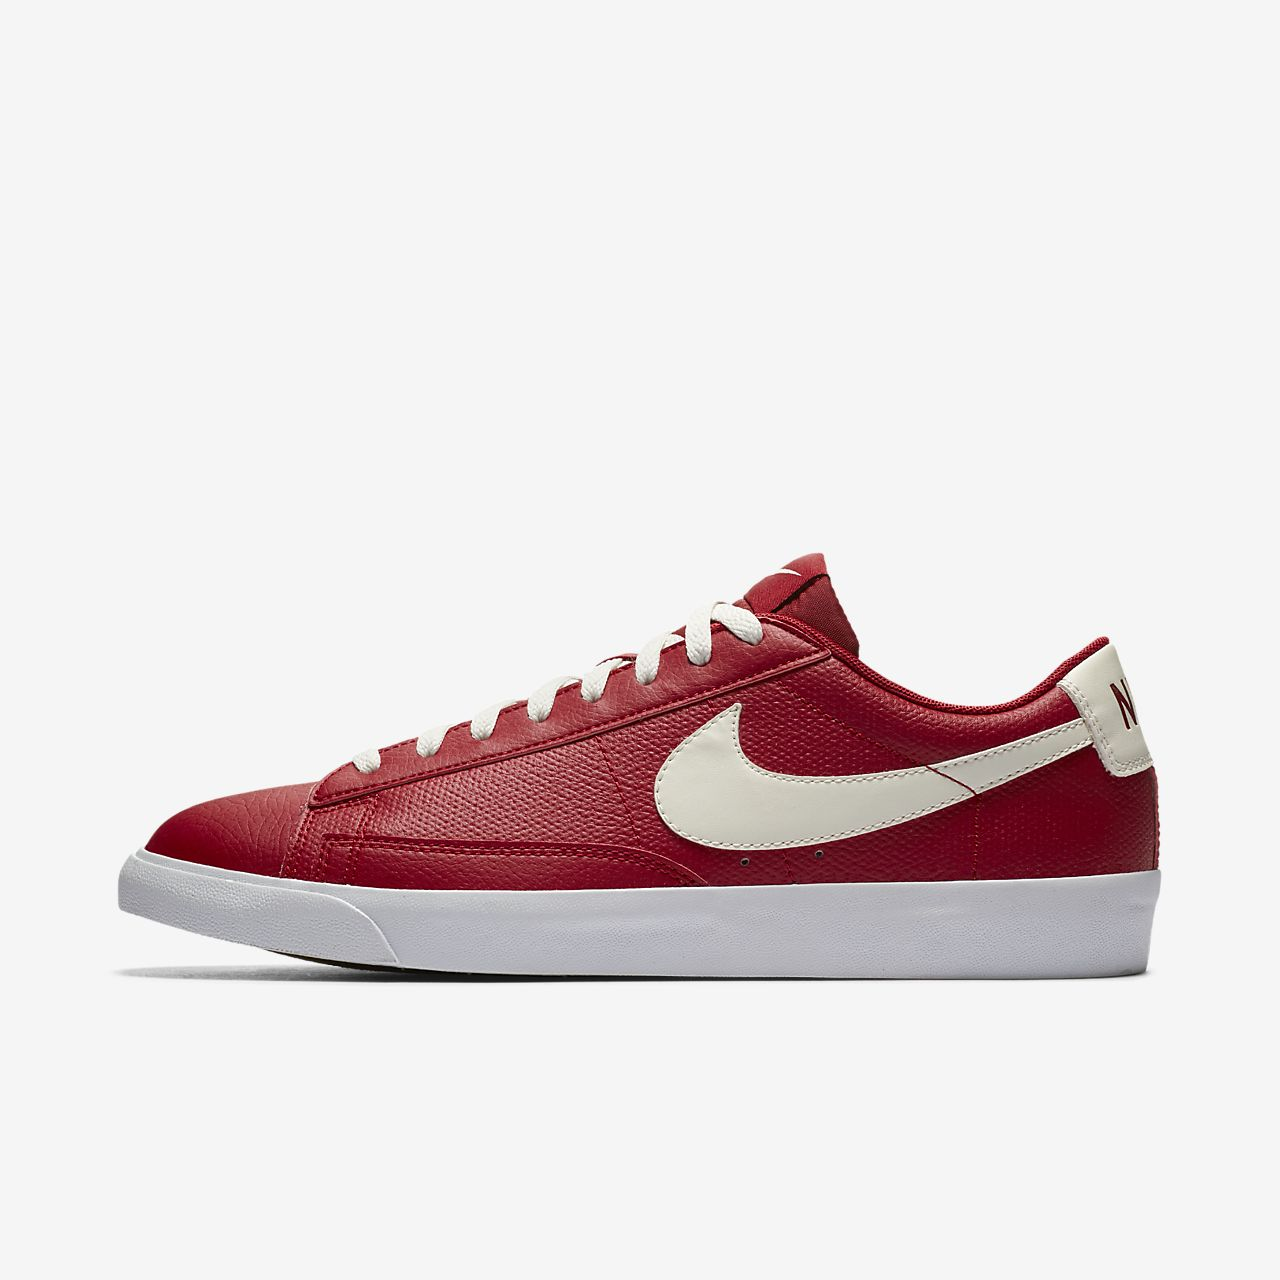 Blazer Low Herrenschuh Moderner Modus Nike nrdcqp6573 Schuhe